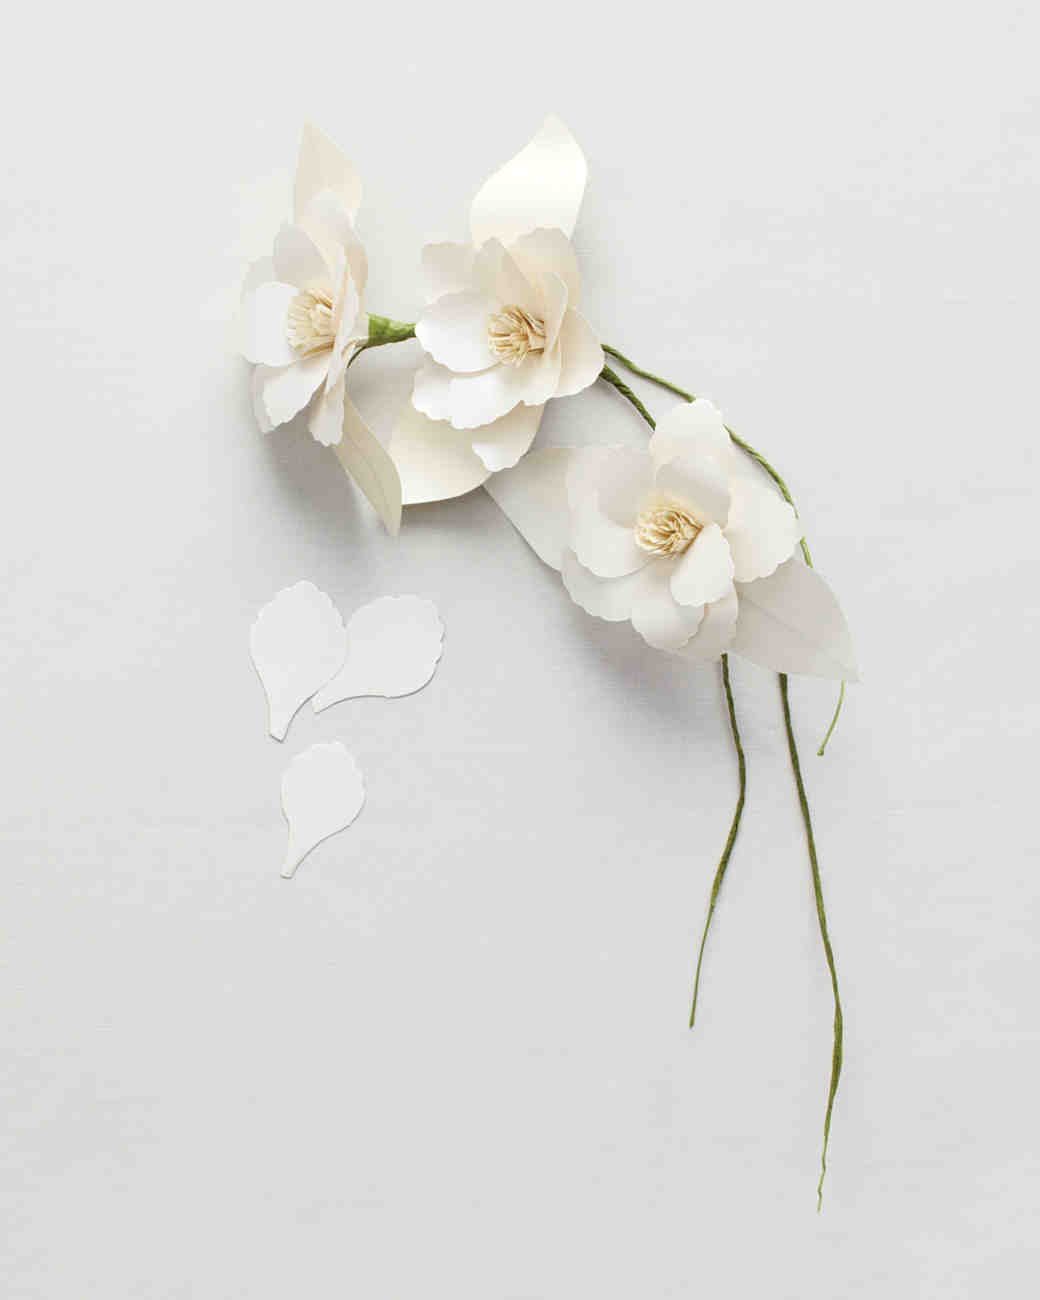 paper-flowers-gt-mwd107748.jpg